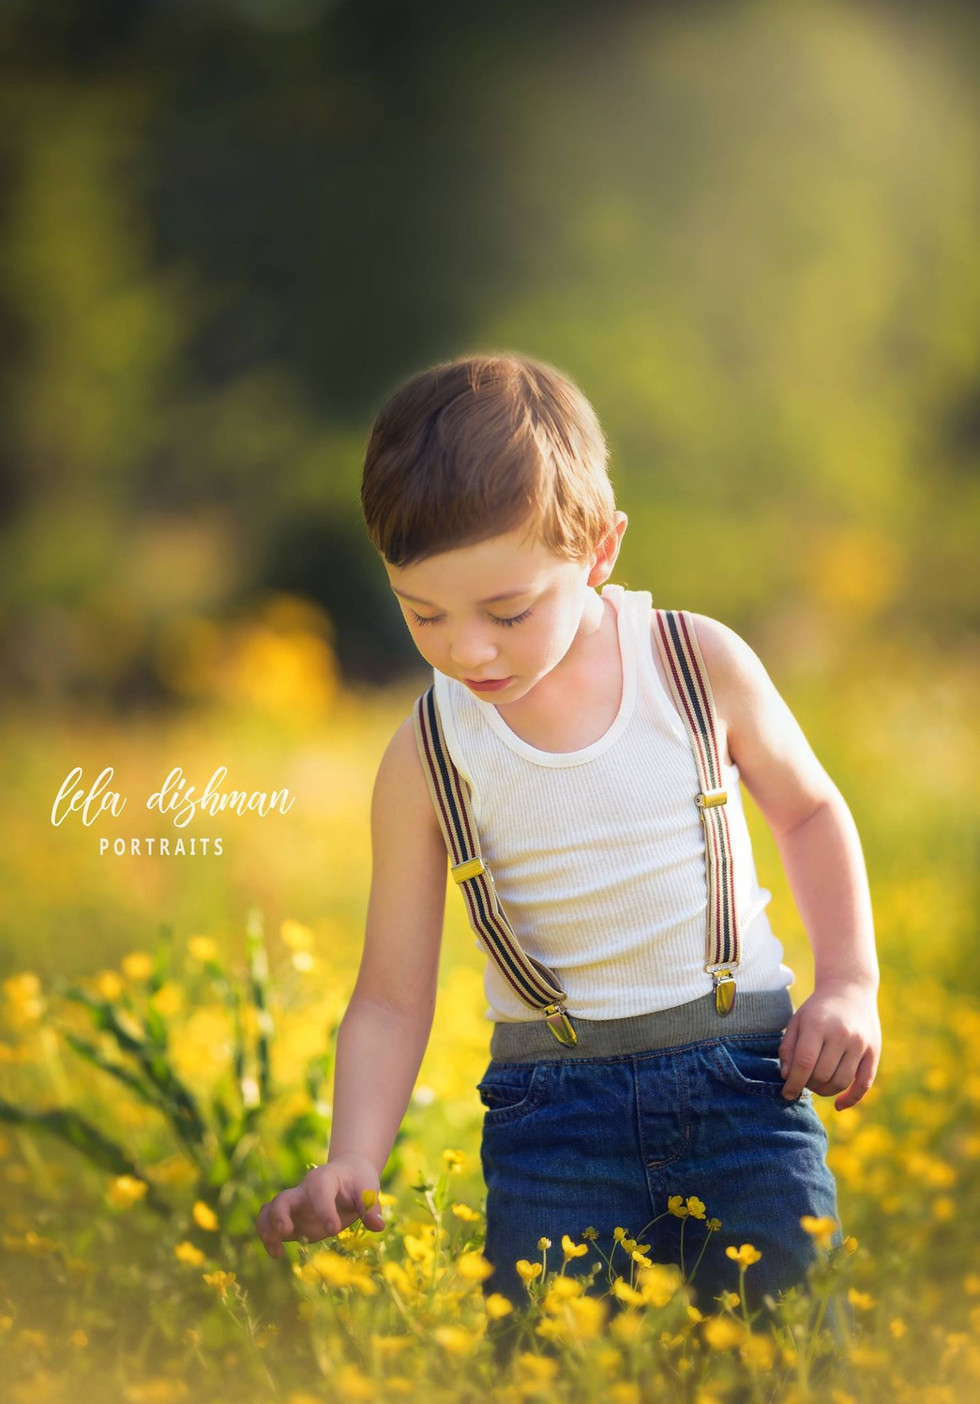 Kentucky Family & Child Photographer ~ Lela Dishman Portraits